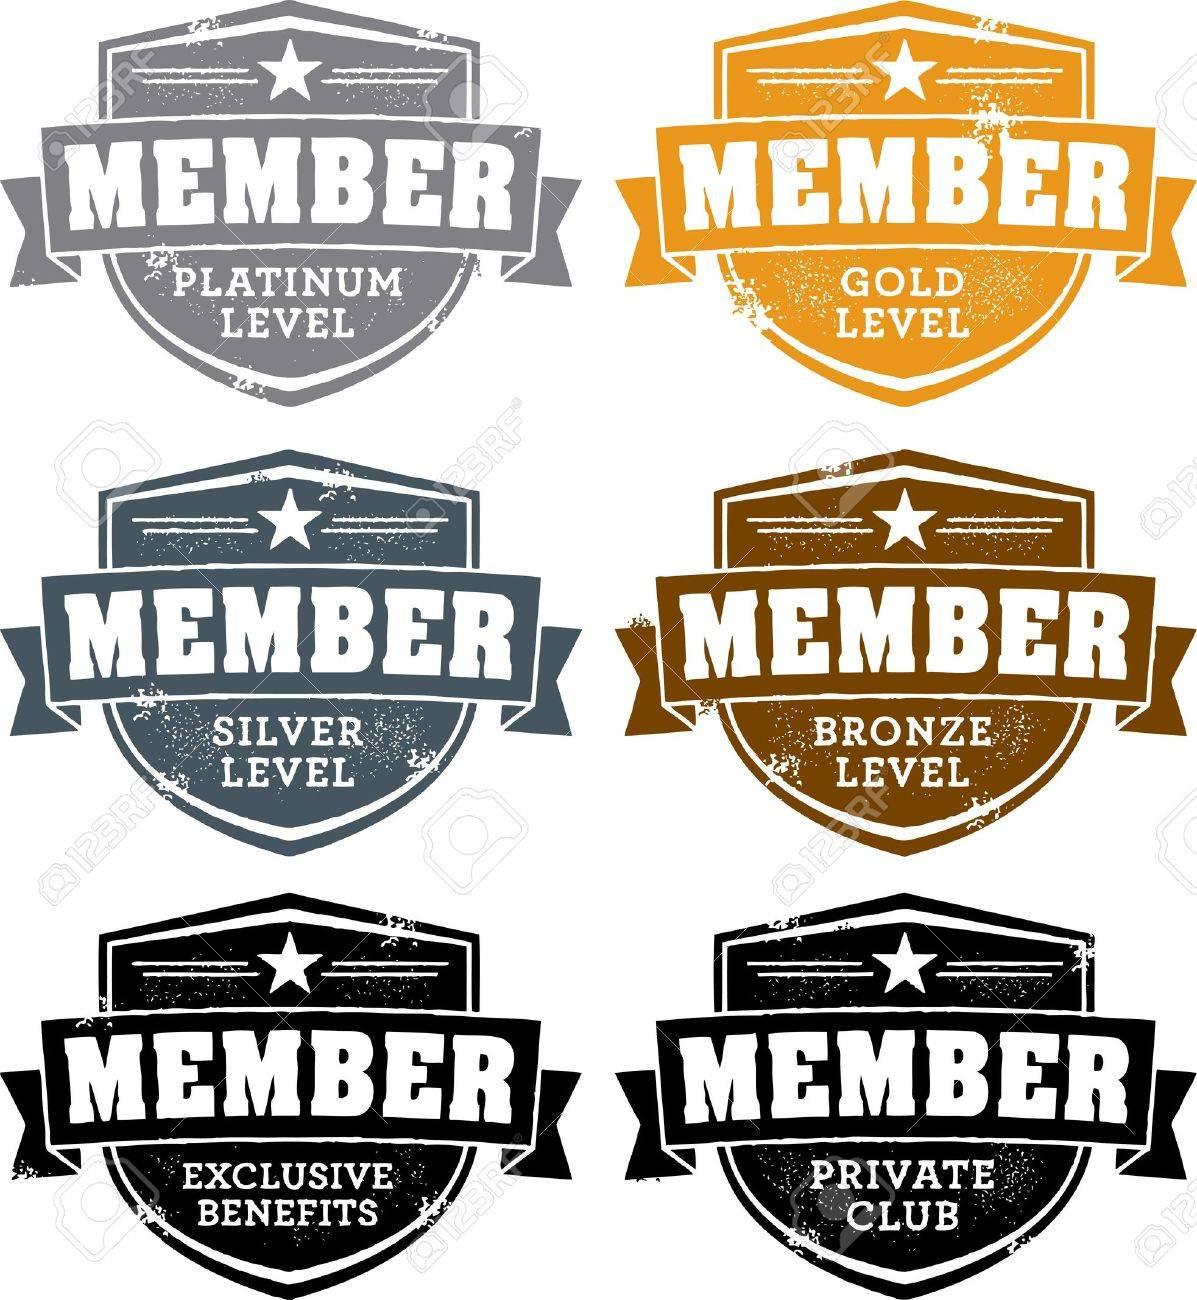 Membership Badges Stock Vector - 12495644